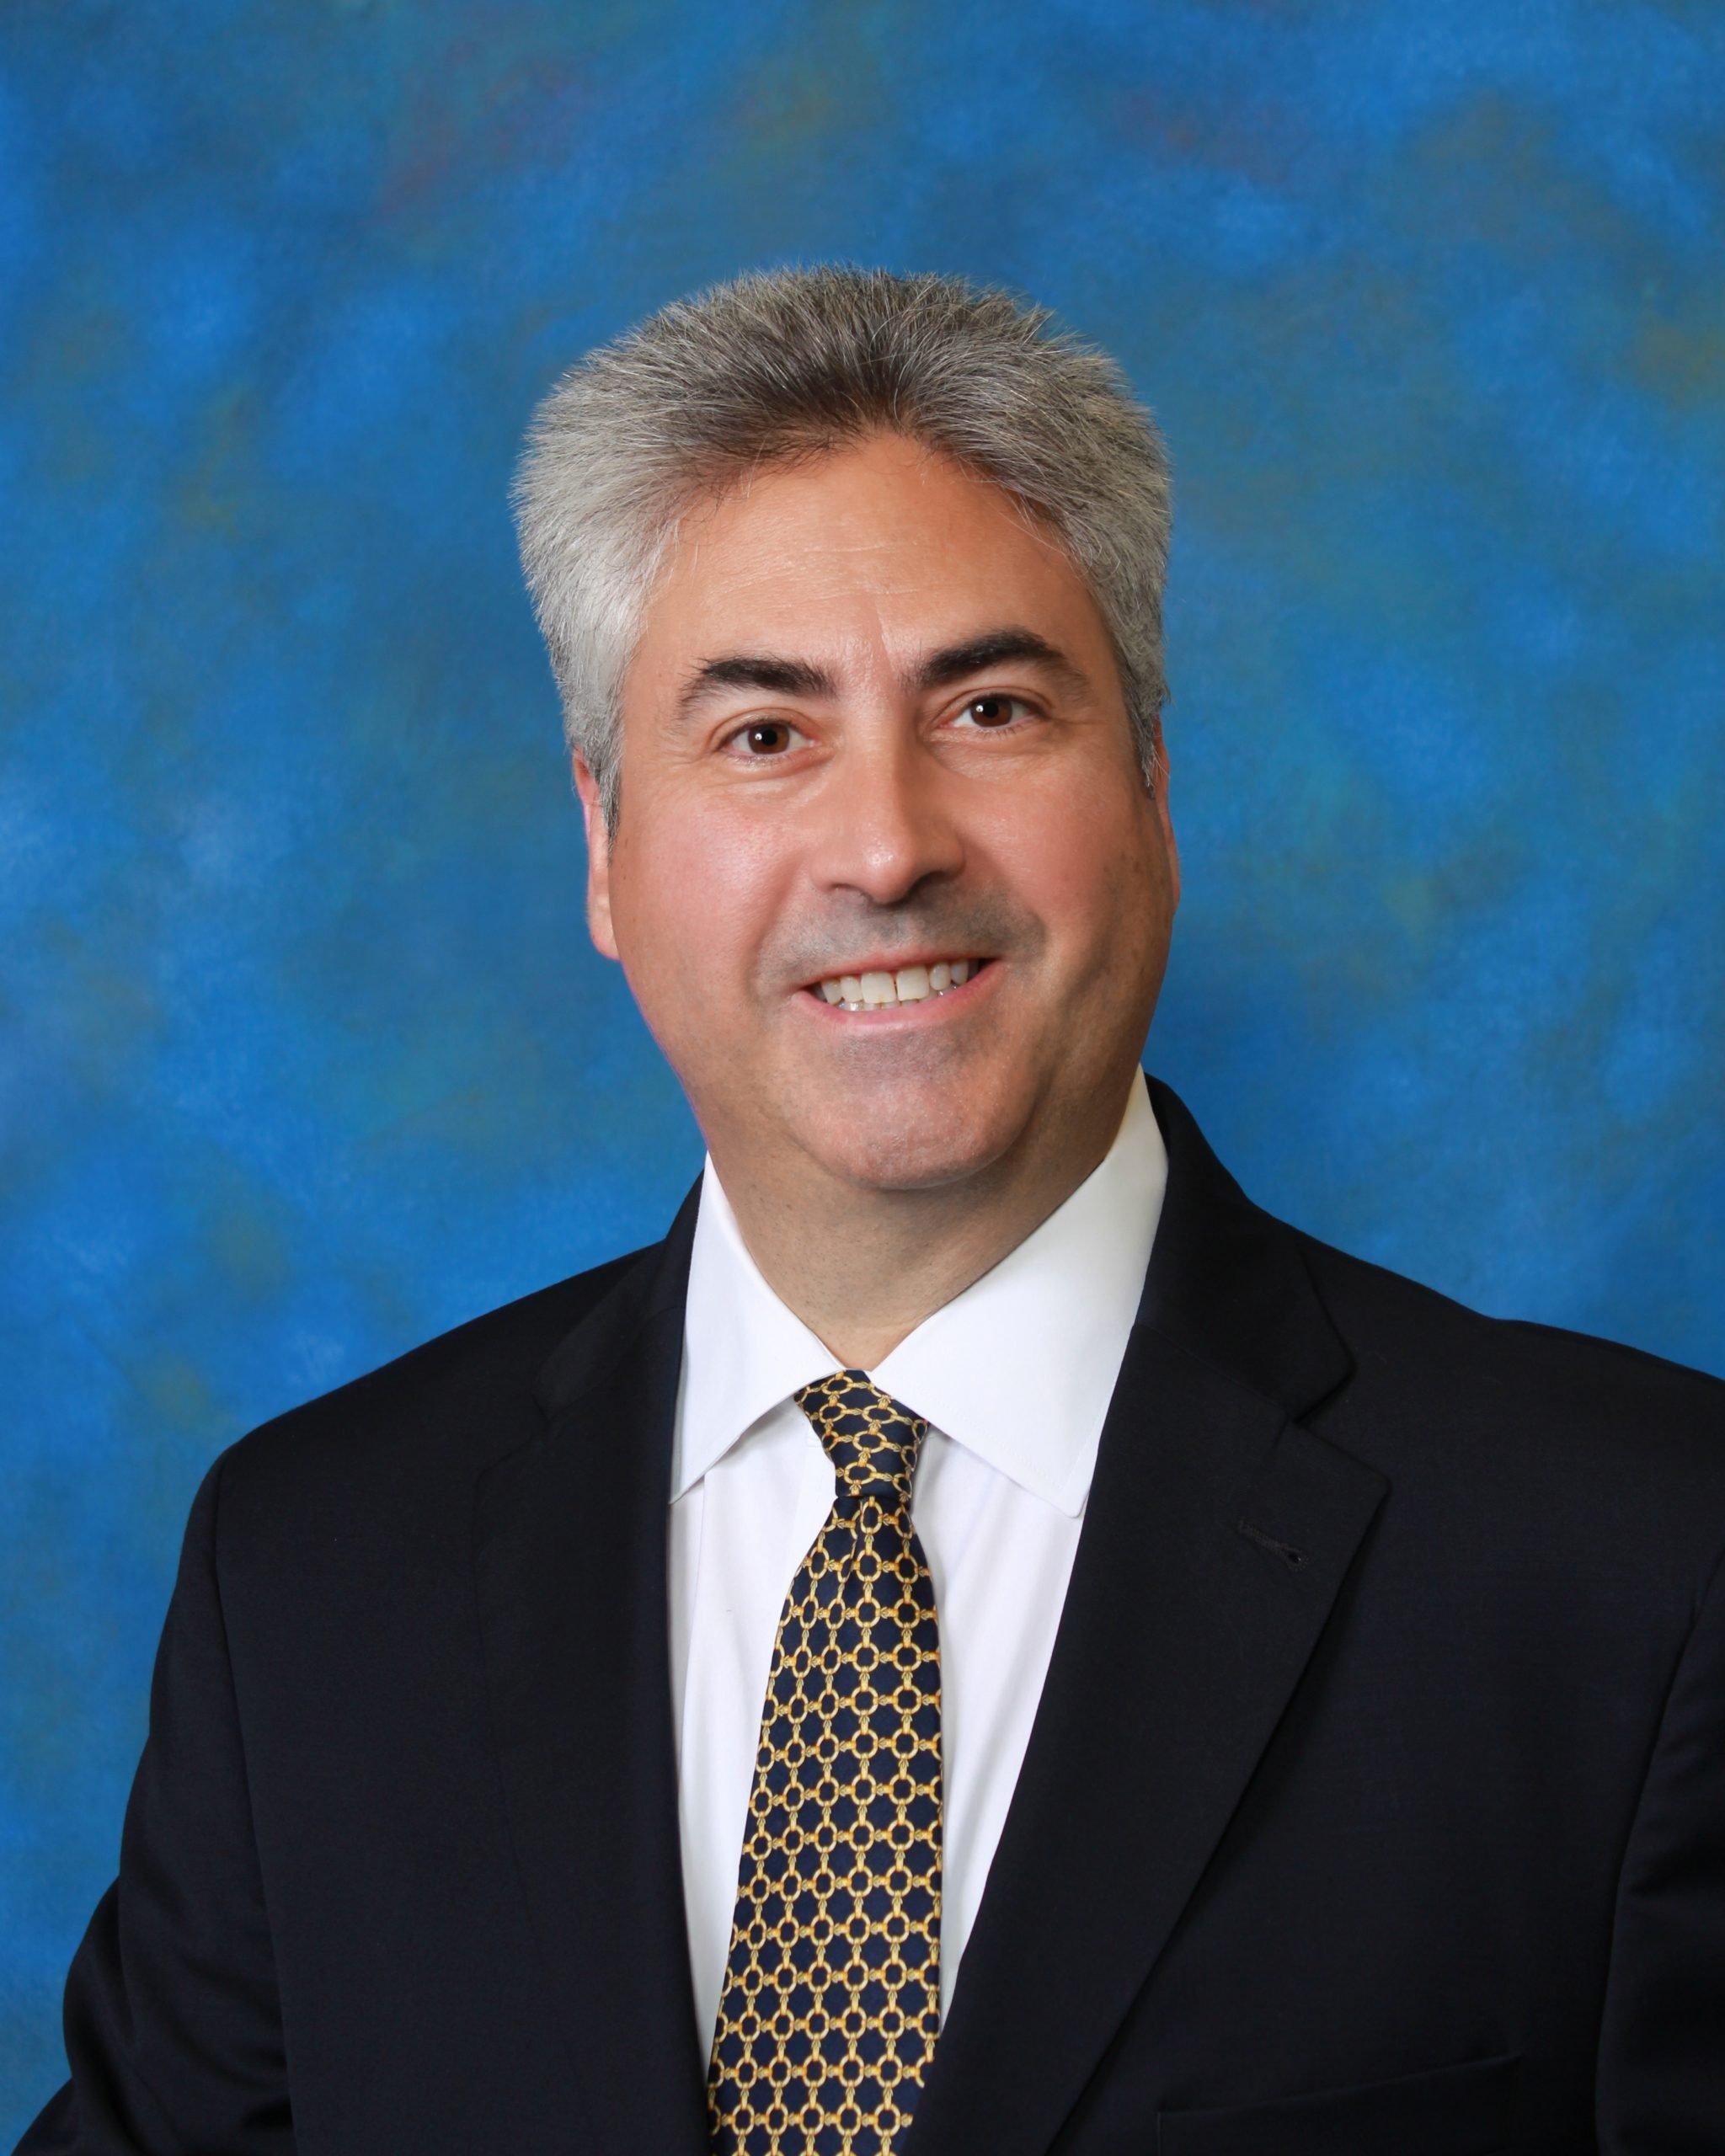 Jeffrey S. Romanick